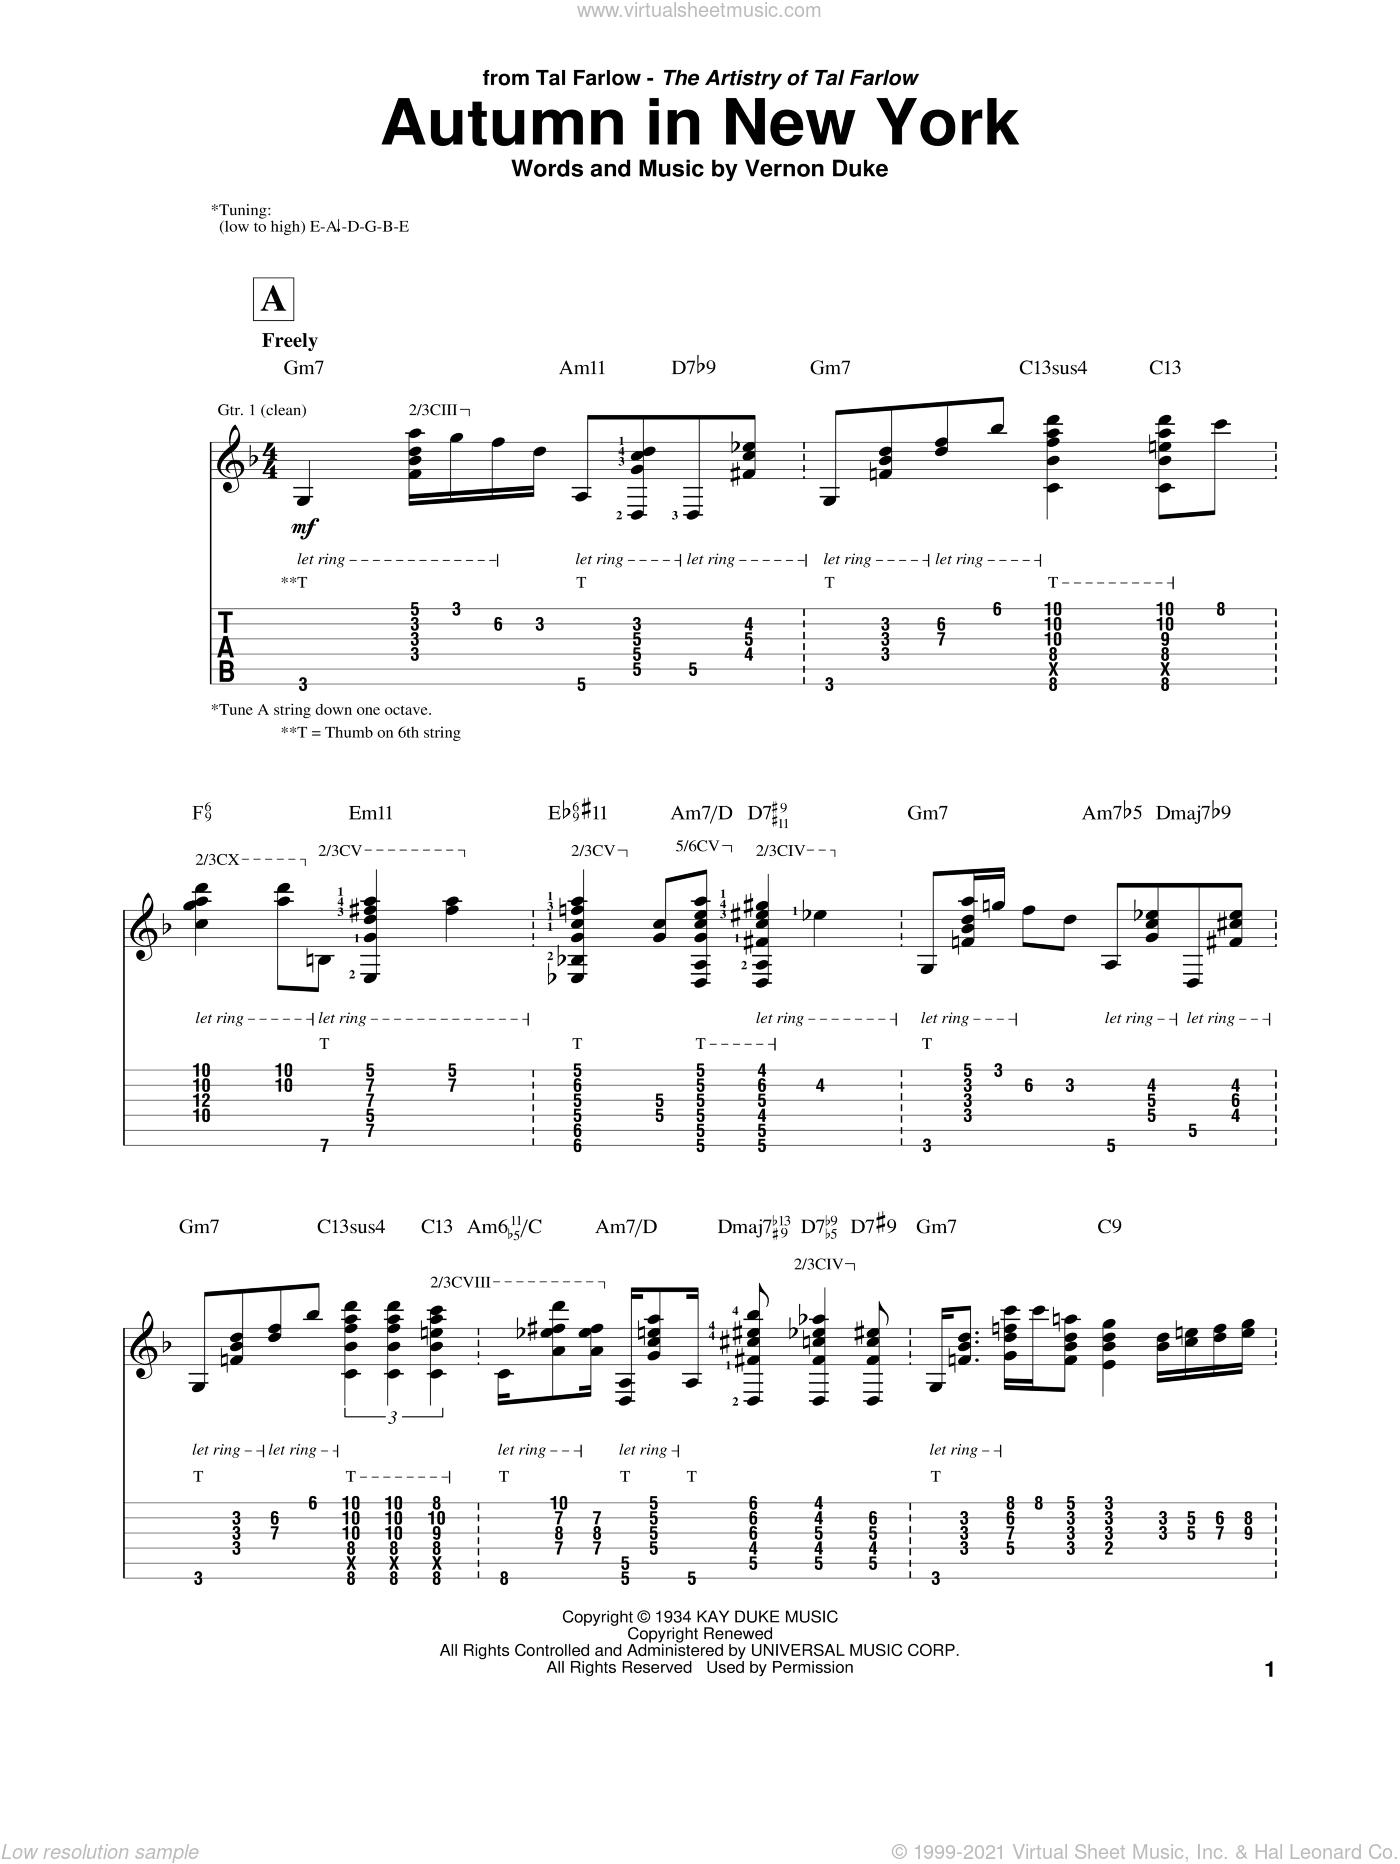 Autumn In New York sheet music for guitar (tablature) by Tal Farlow, Bud Powell, Jo Stafford and Vernon Duke, intermediate skill level